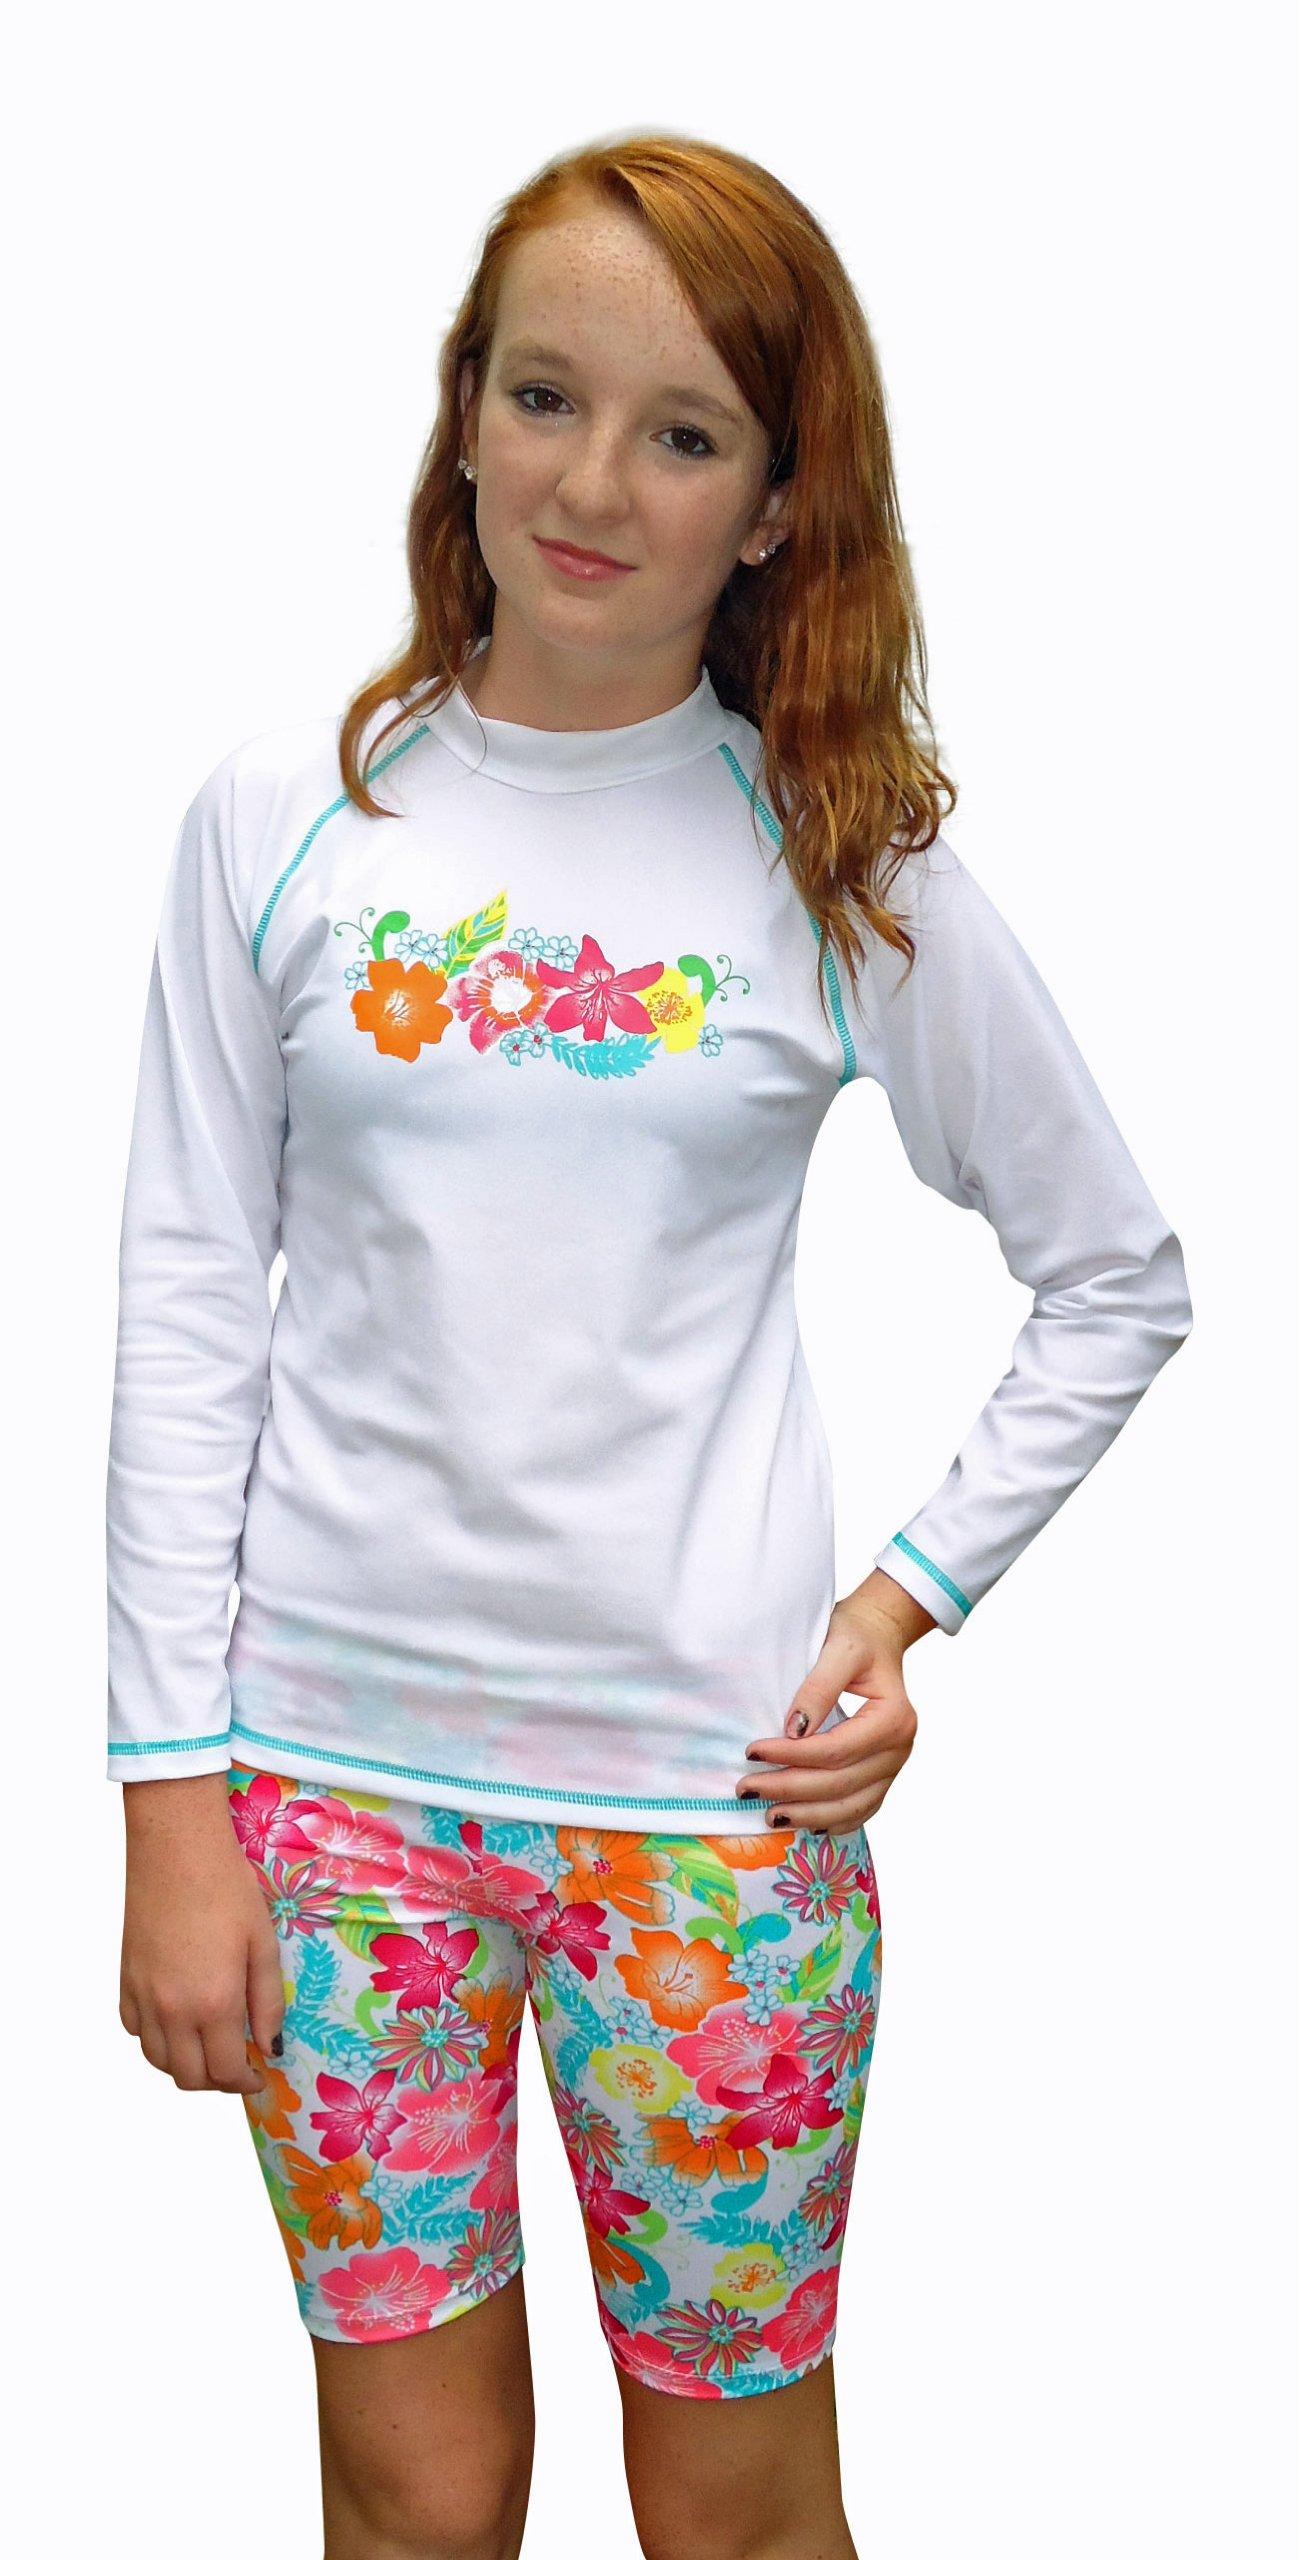 Sun Emporium Girls Long Sleeve UV Sun Protective Rash Guard Swim Shirt and Shorts 2 -piece Set- UPF/SPF Protection, Floral, 12 by Sun Emporium